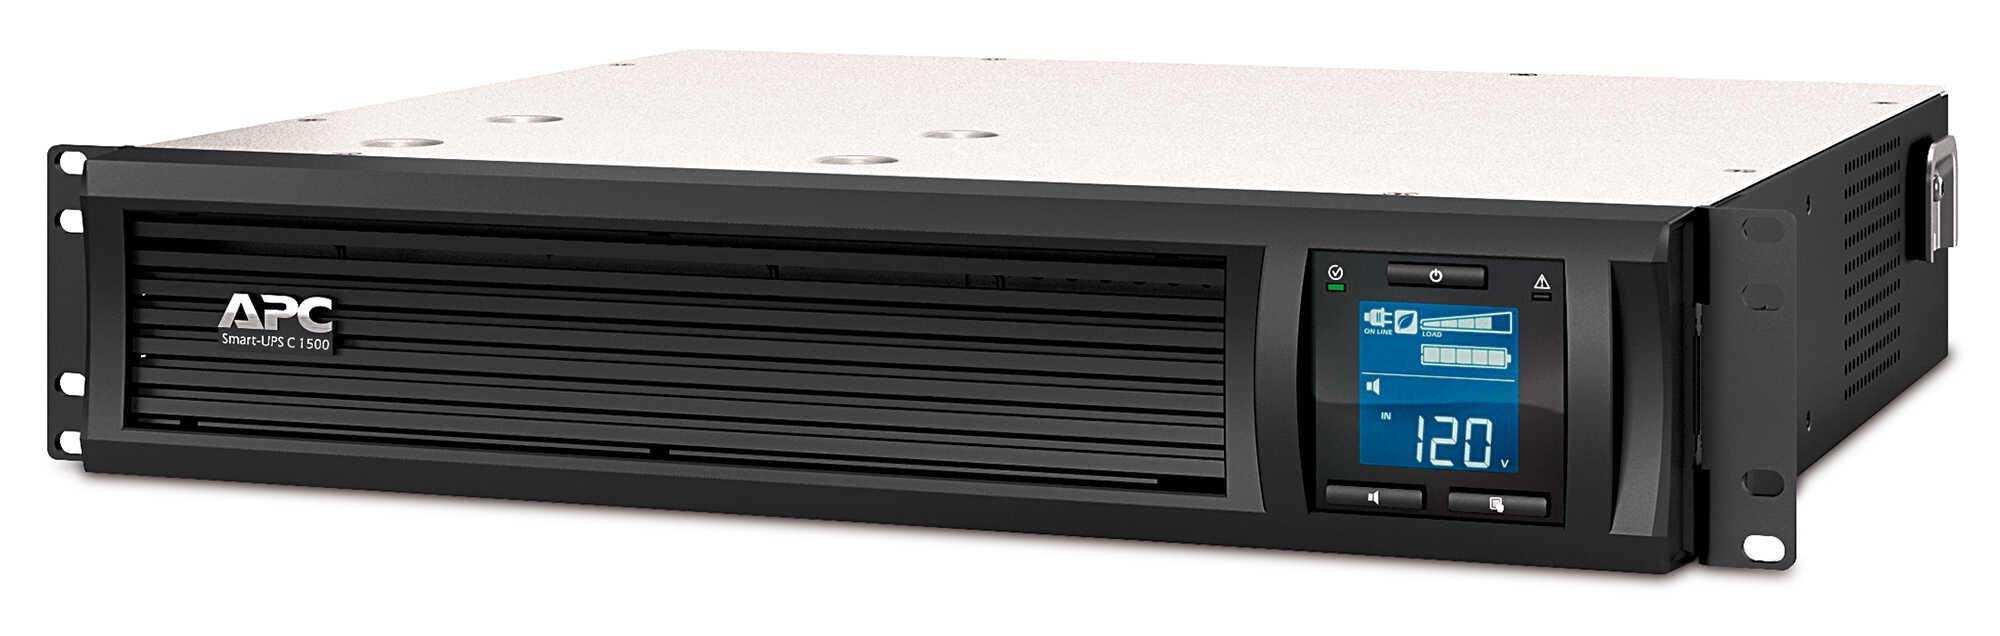 APC Smart-UPS C 1500VA LCD RM 2U 230V with SmartConnect